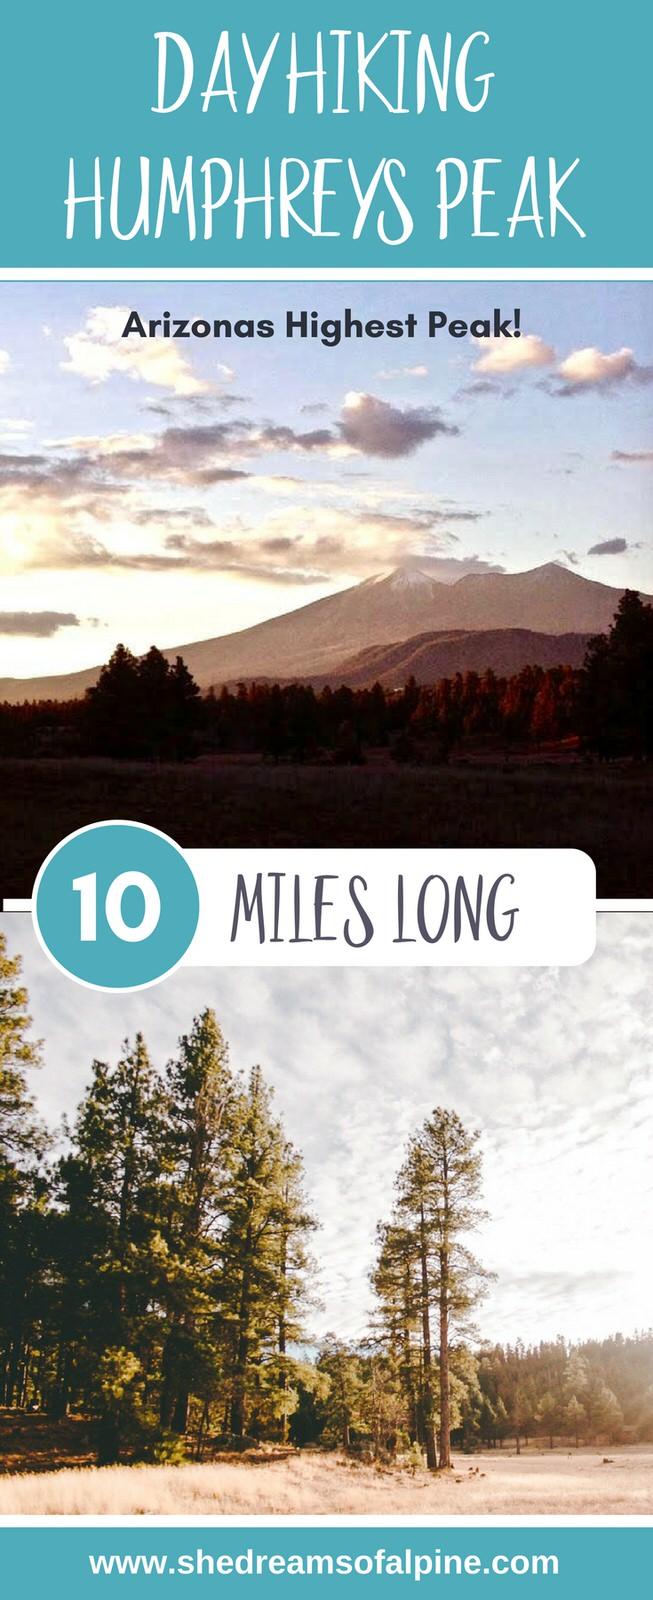 10 Miles Day Hiking Humphreys Peak Trail in Arizona